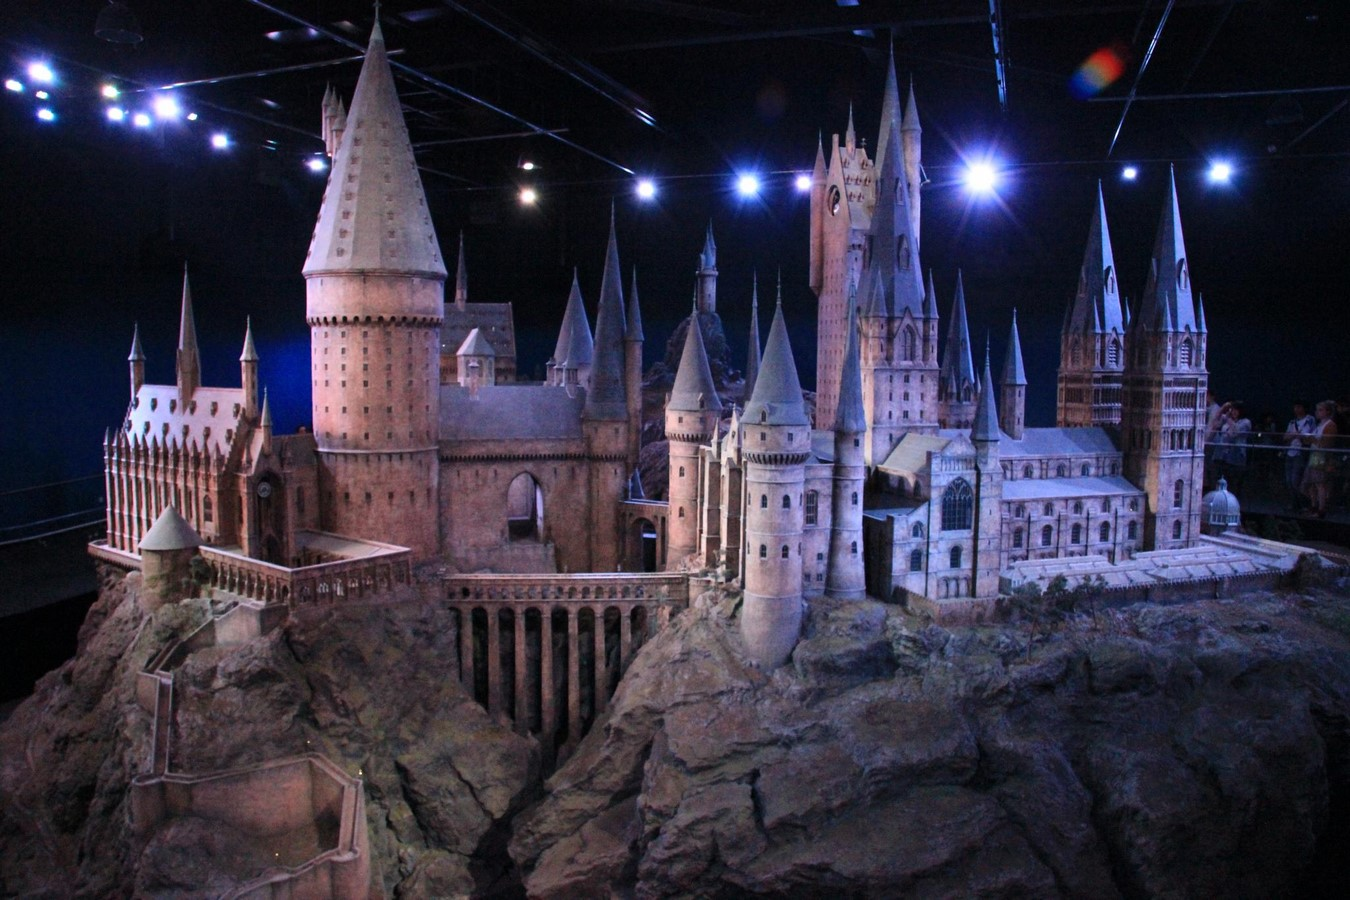 J.K. Rowling as an architect - Sheet2